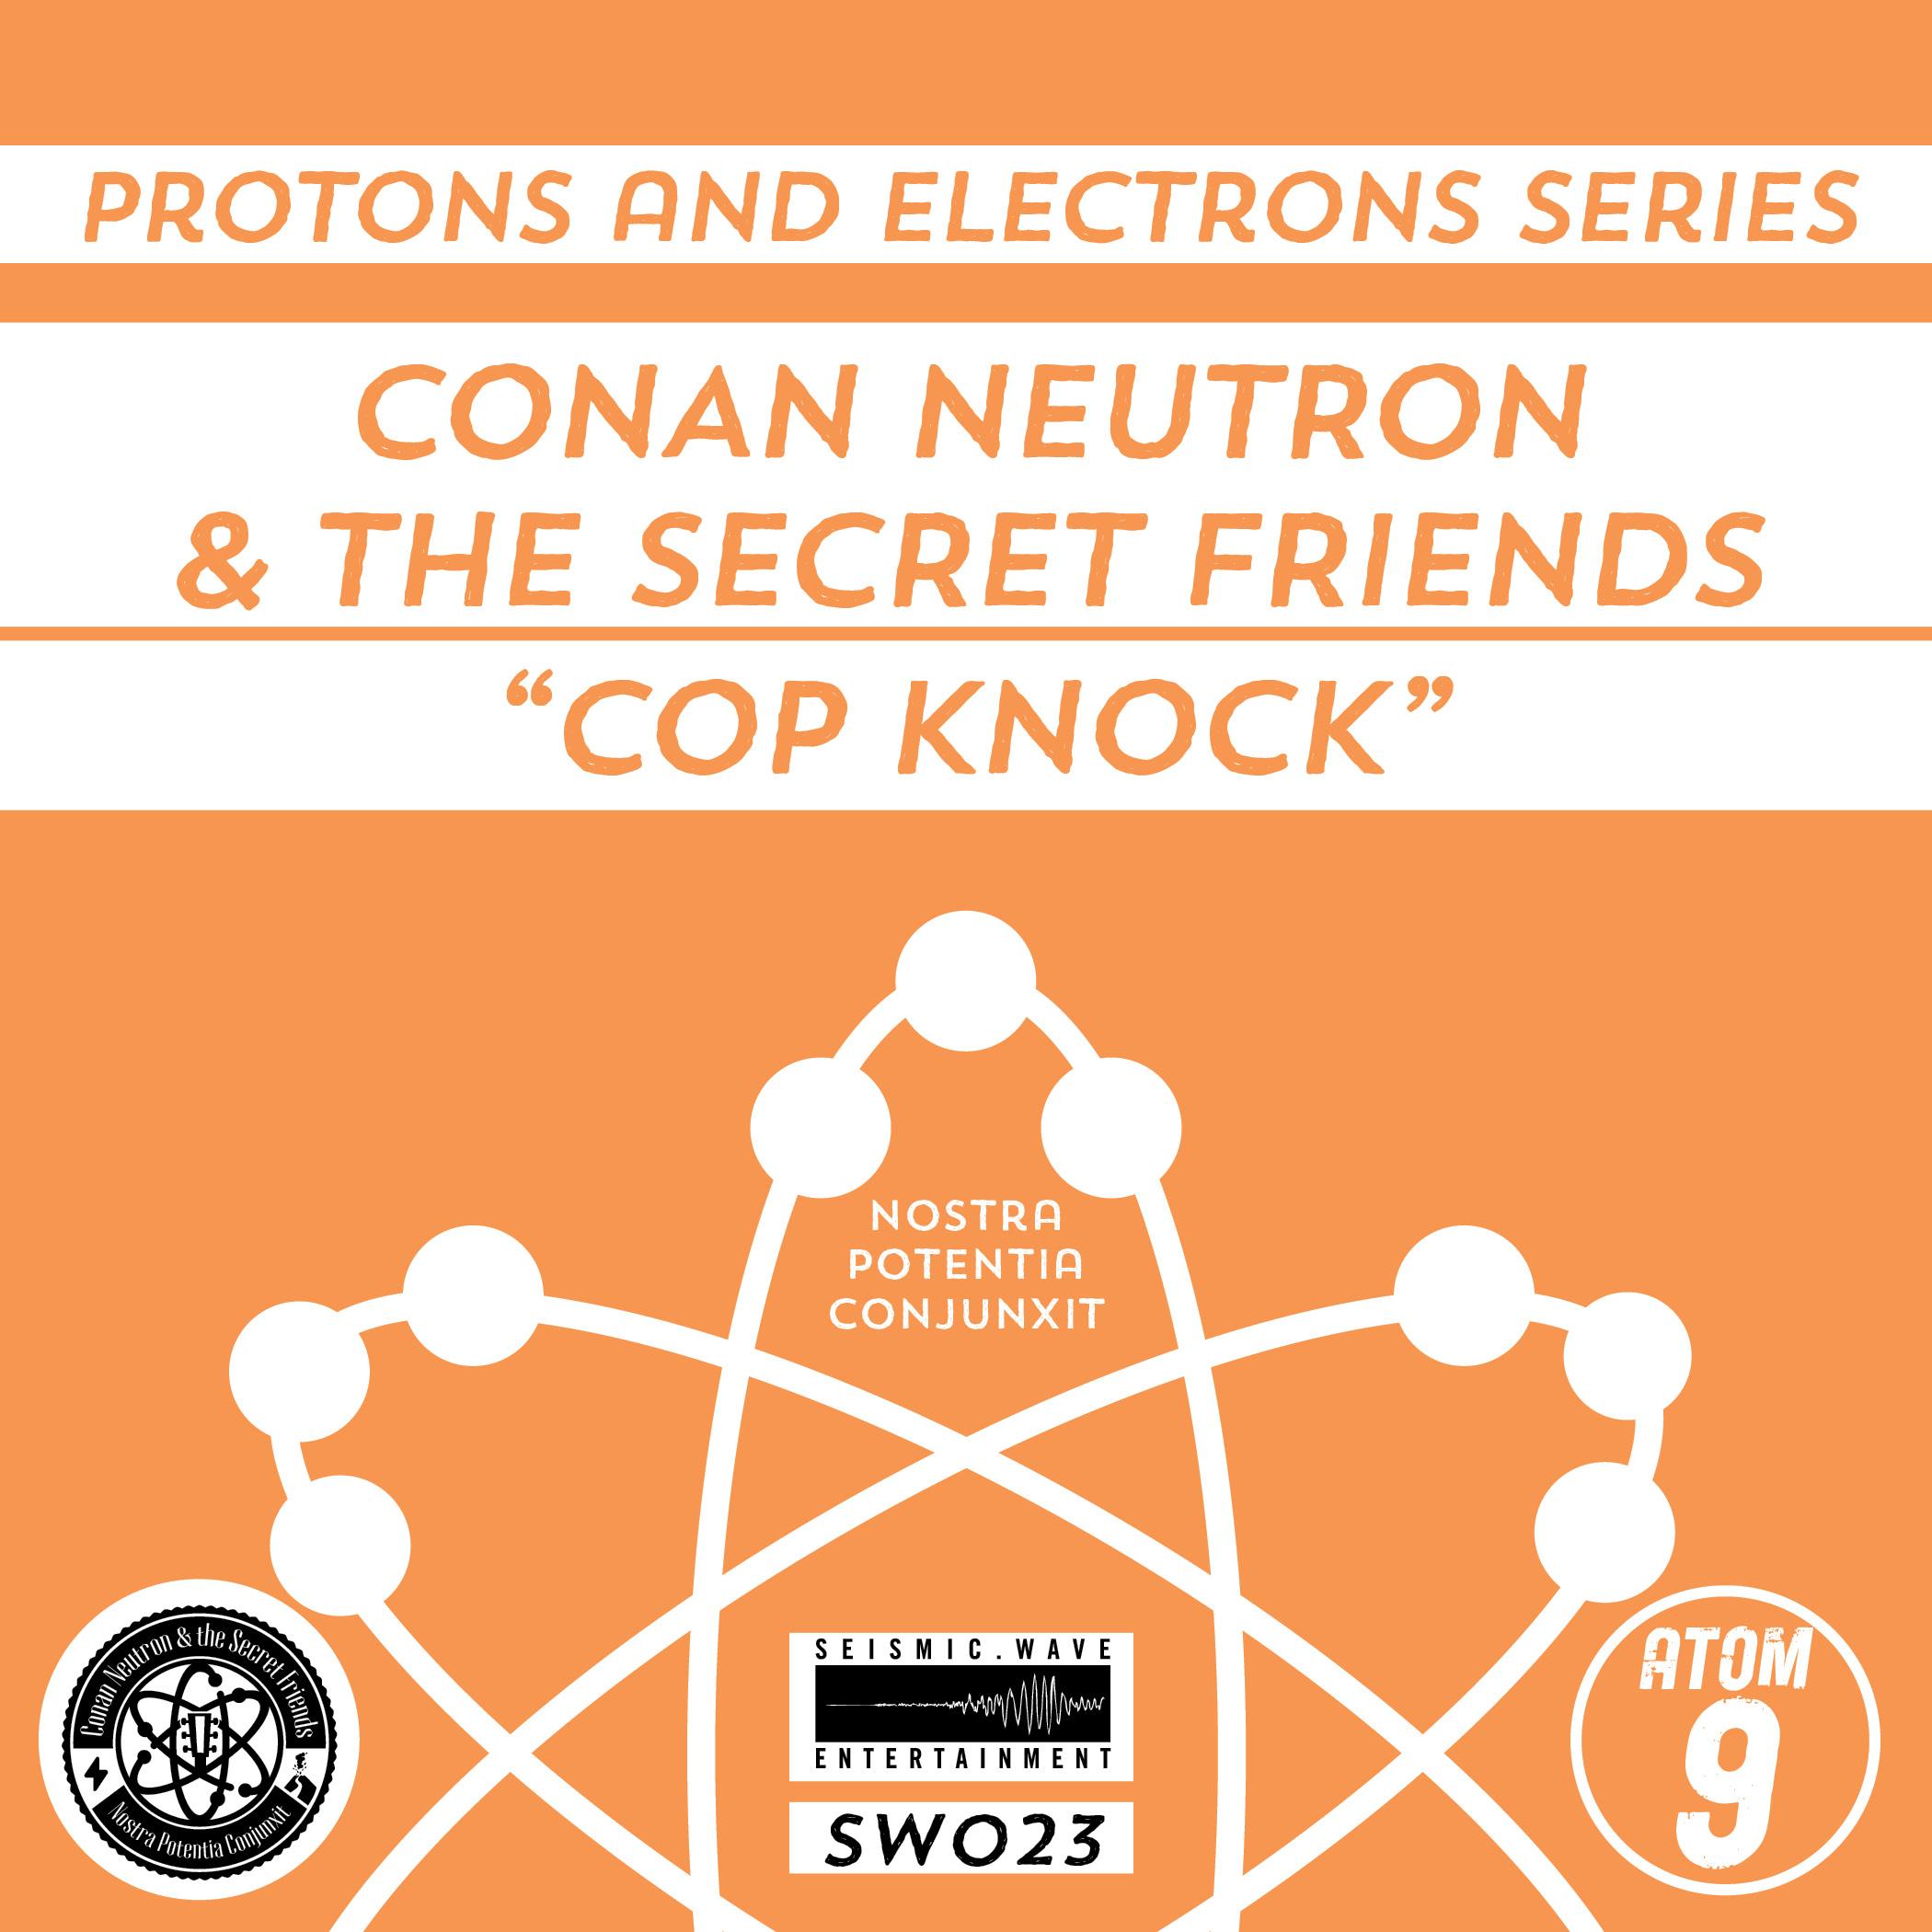 Conan Neutron & the Secret Friends - Cop Knock (Single)  Release Date: 5/6/19 Devices Used:  Cloven Hoof  /  Bit Commander  /  Tone Reaper